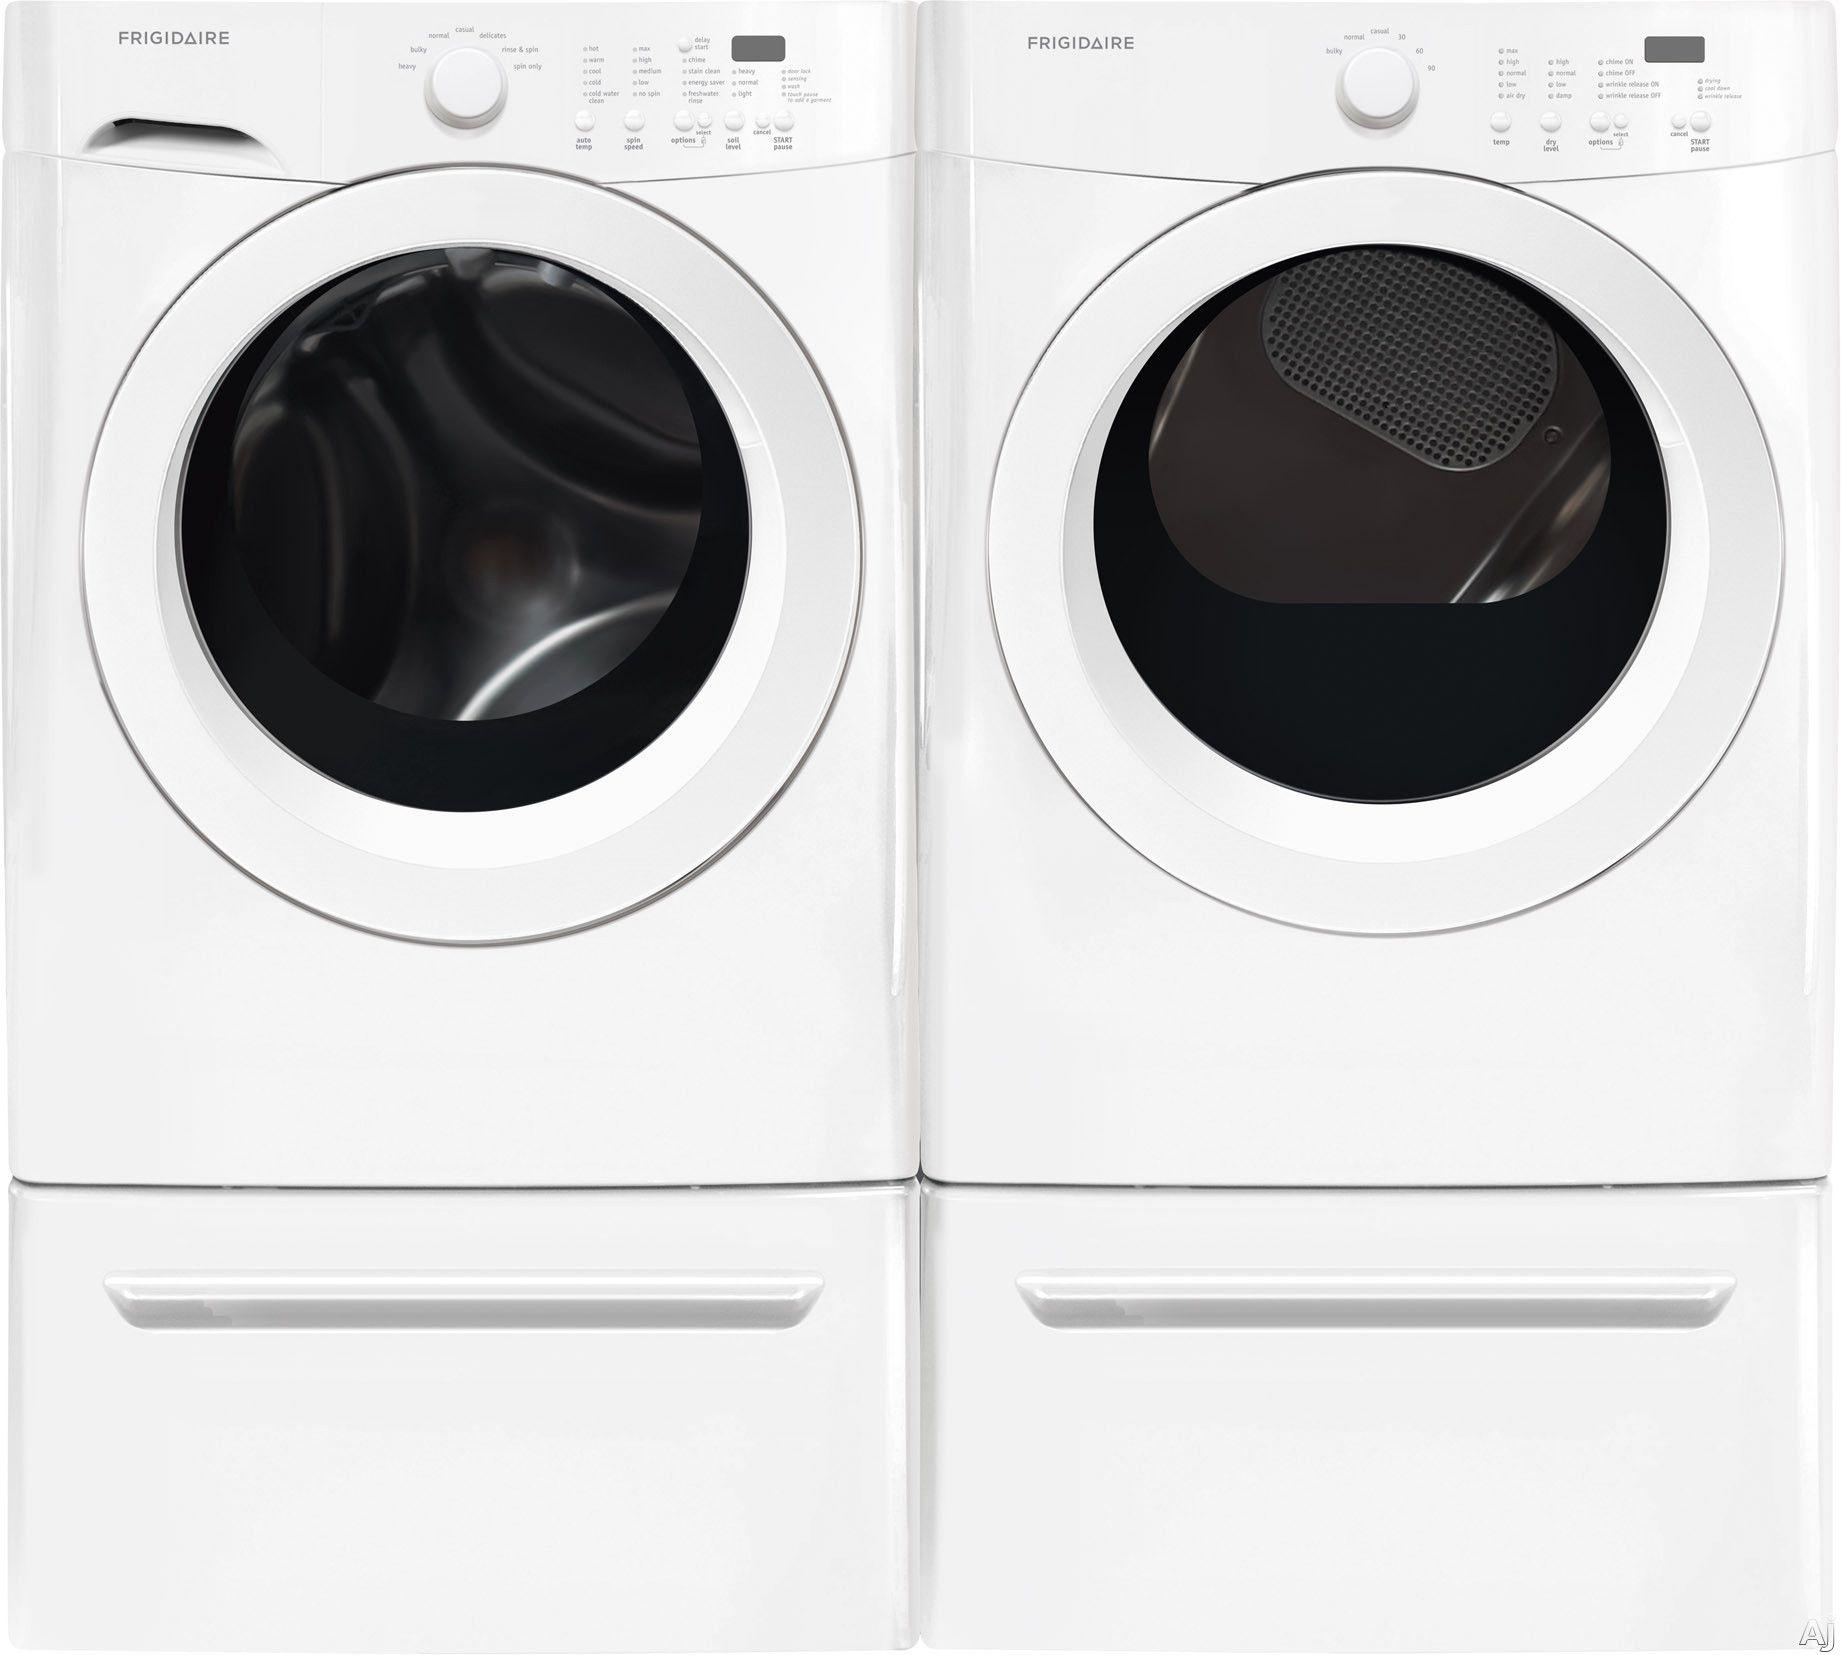 furniture rc samsung willey jsp platinum washer and view laundry rcwilley store dryer pedestals inch appliances pair pedestal